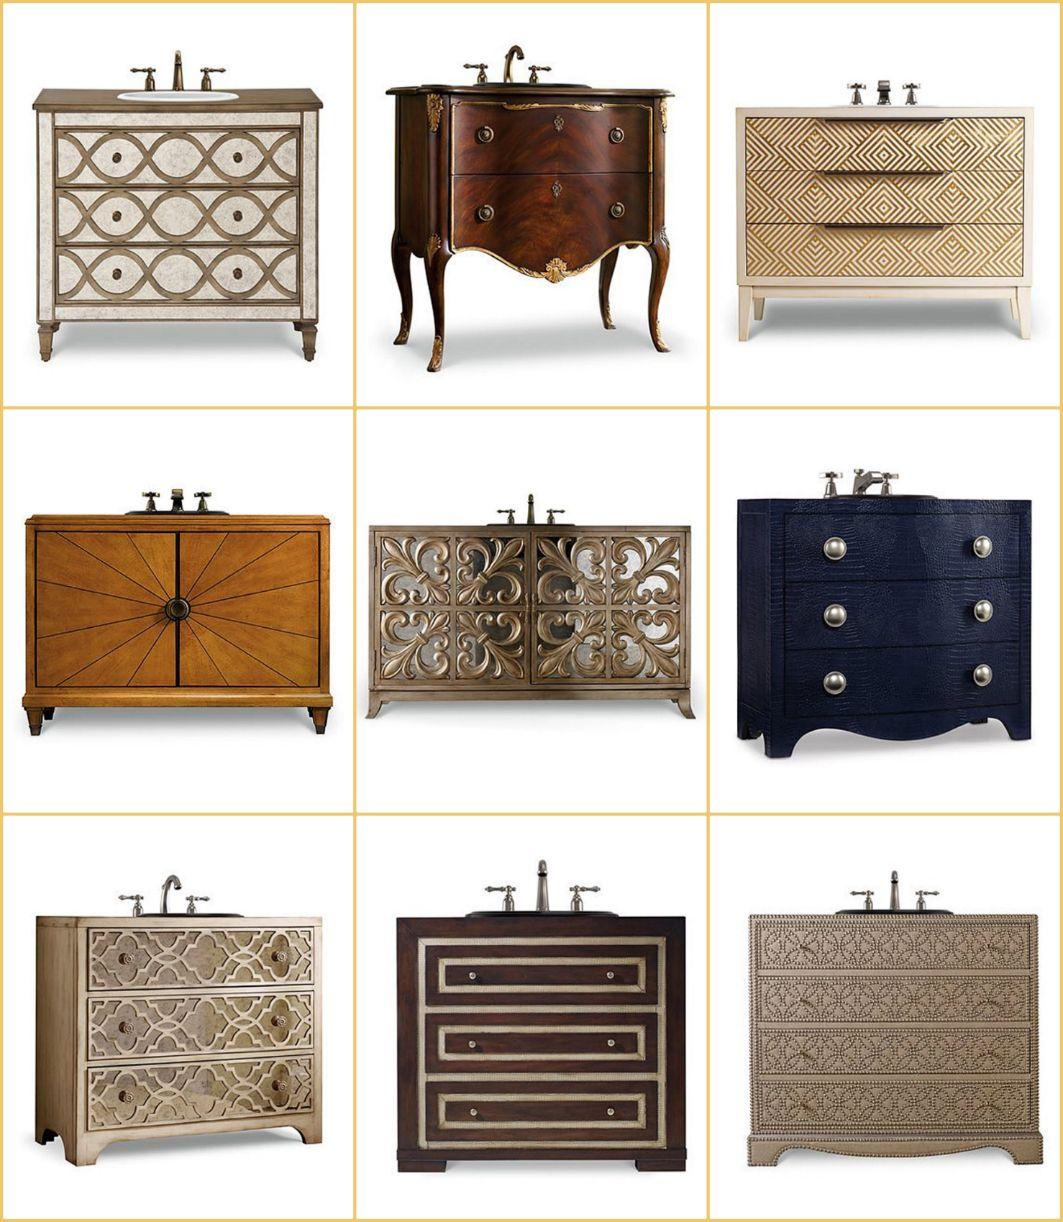 Betterdecoratingbible: This Shop Is Interior Design's Hidden Gem! Great Deals On